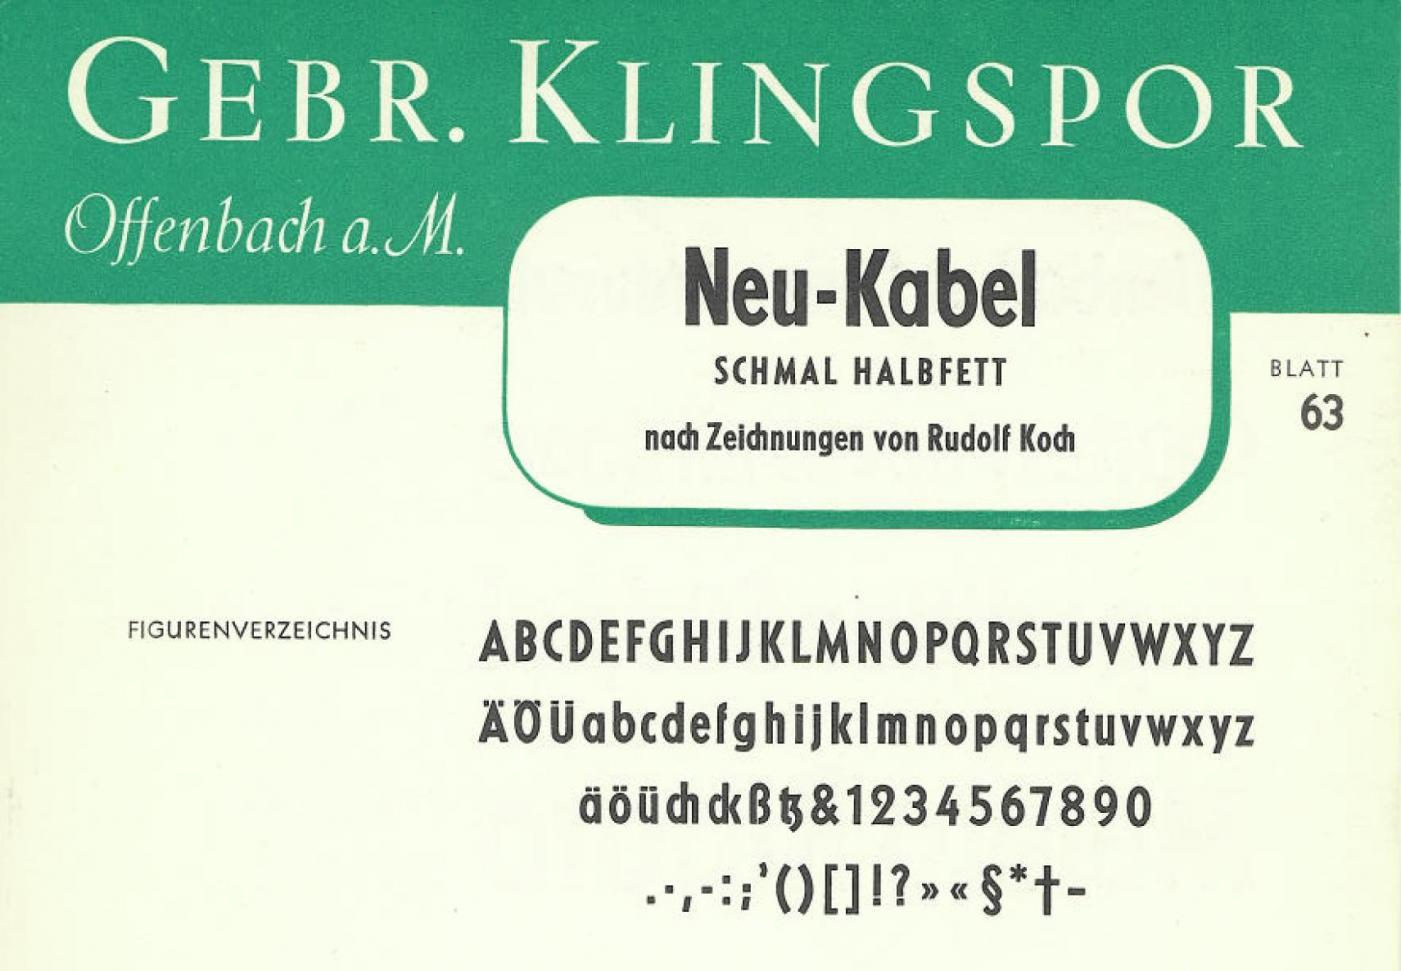 59b2c9e4b66b0_Neu-Kabelschmalhalbfett.thumb.jpg.975aab0ccf1927d123d02d4aac4259ea.jpg